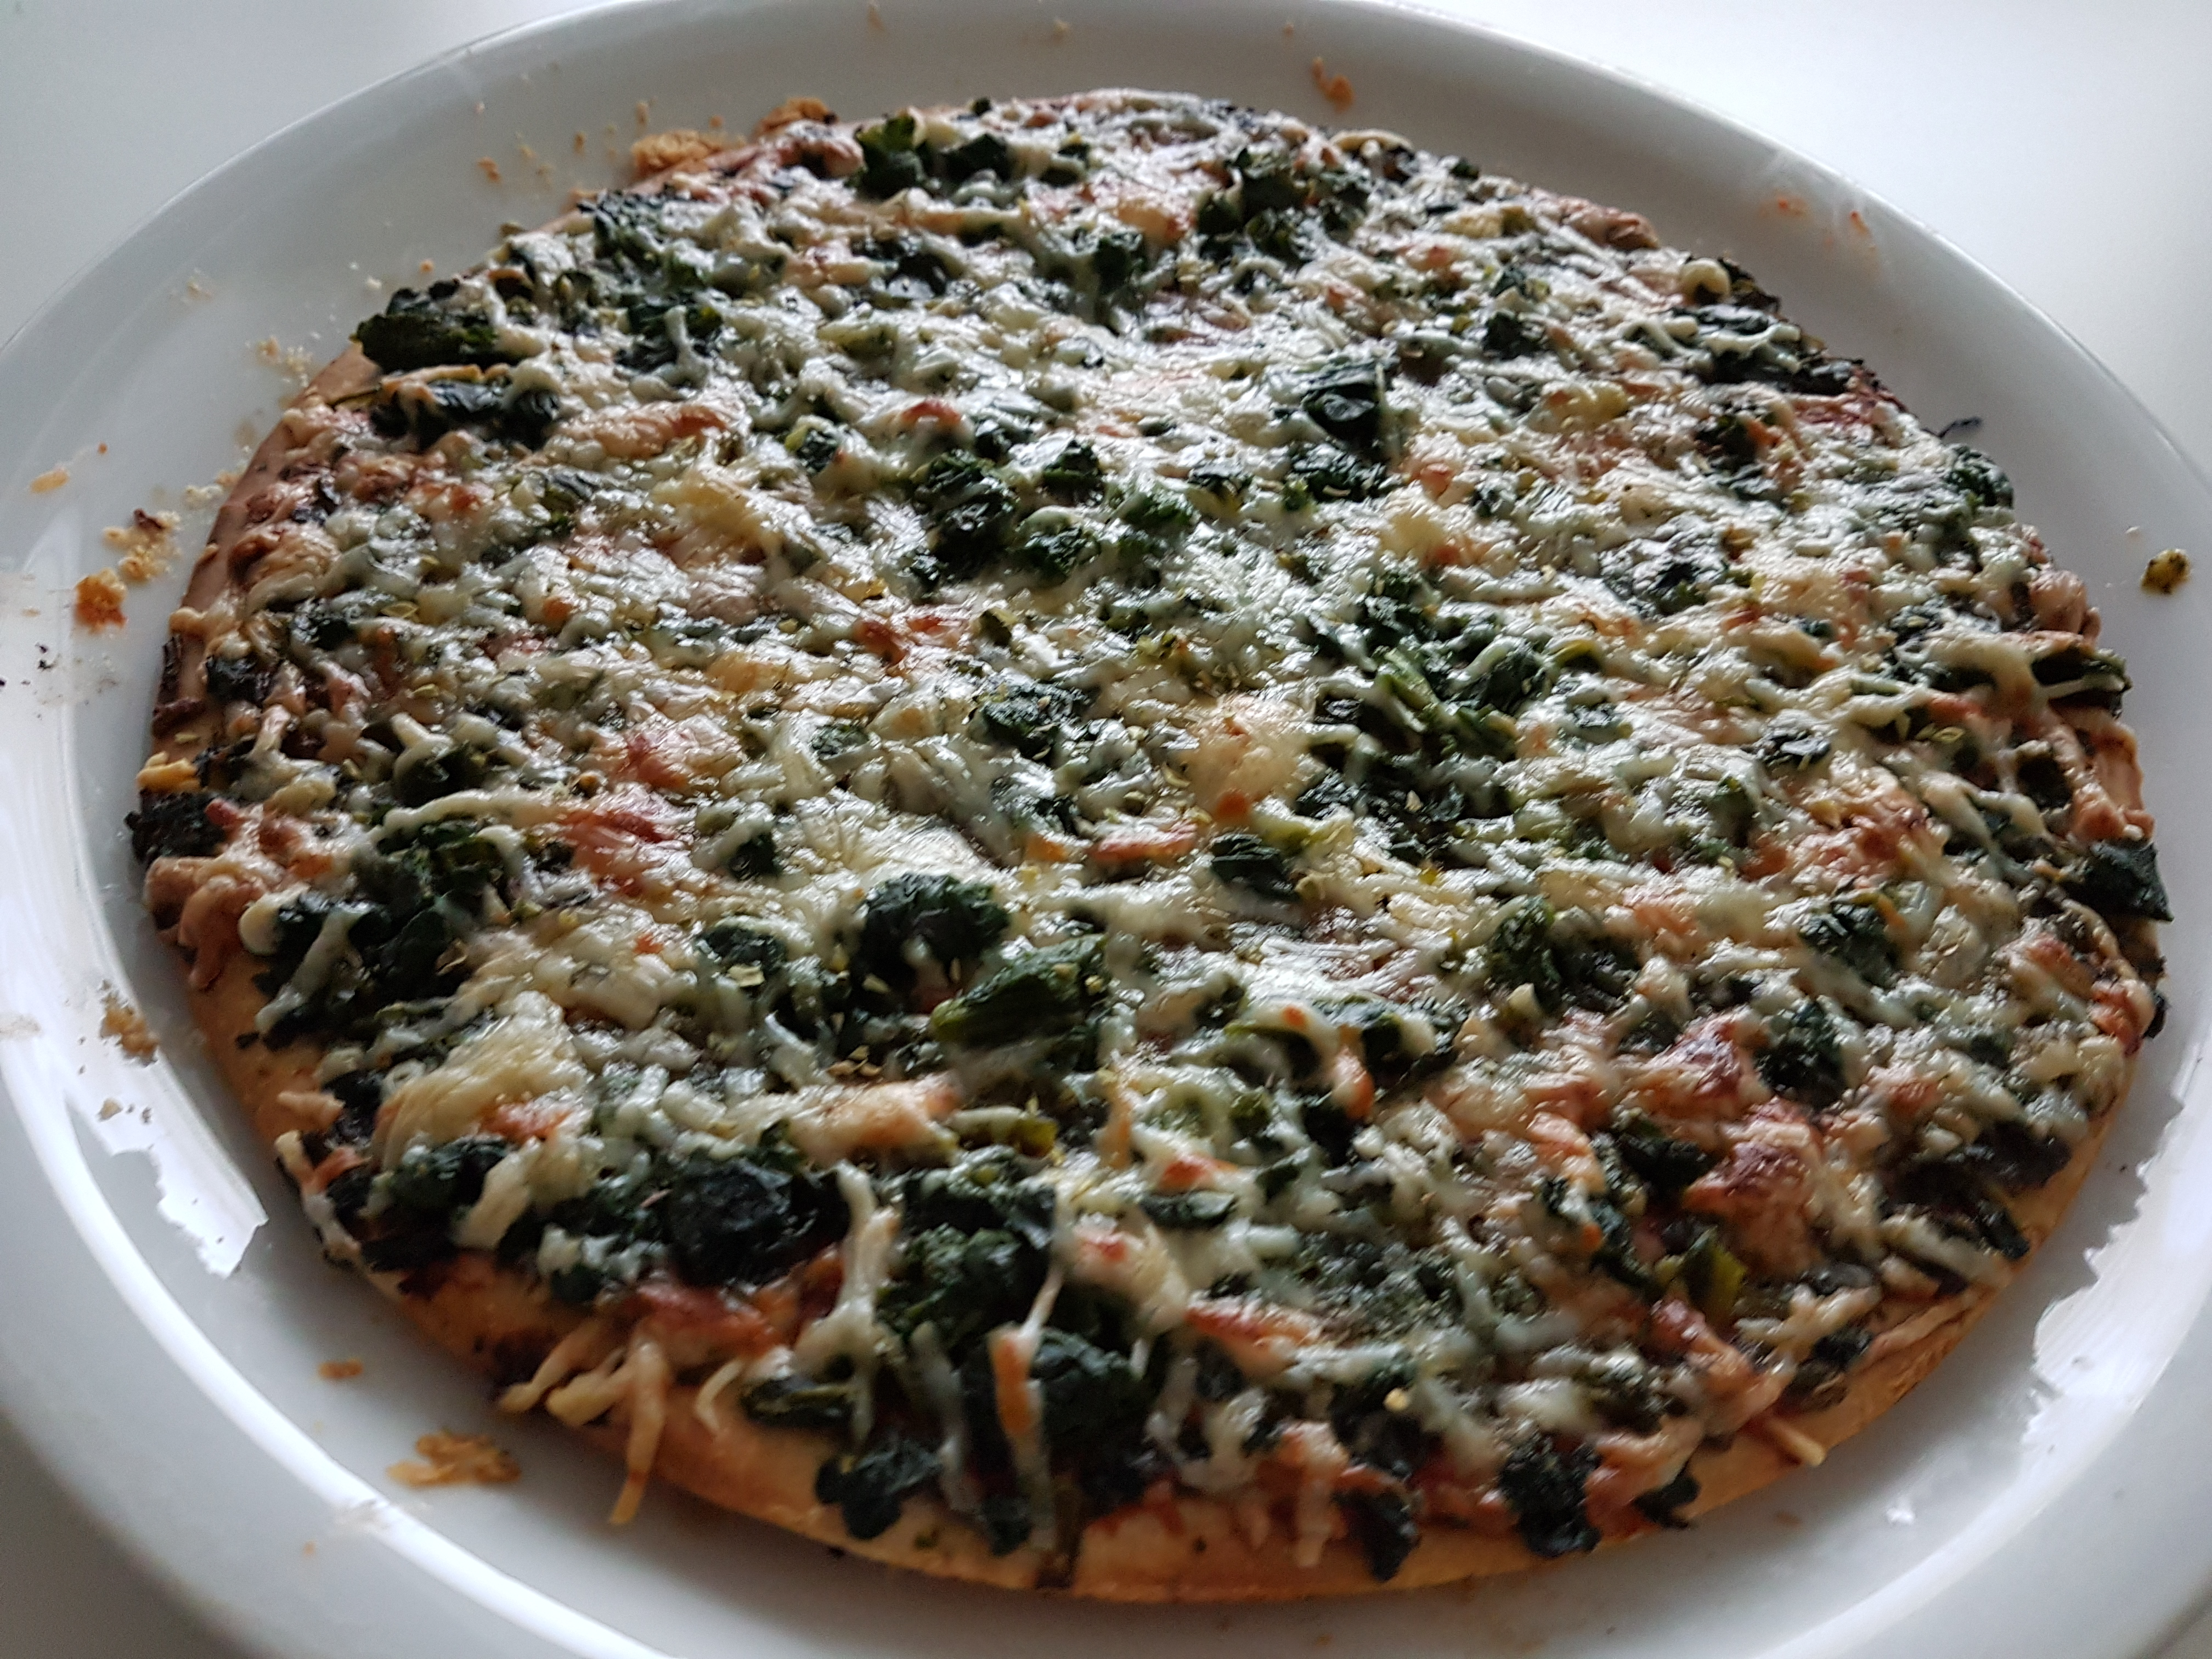 http://foodloader.net/Holz_2017-05-04_Pizza.jpg